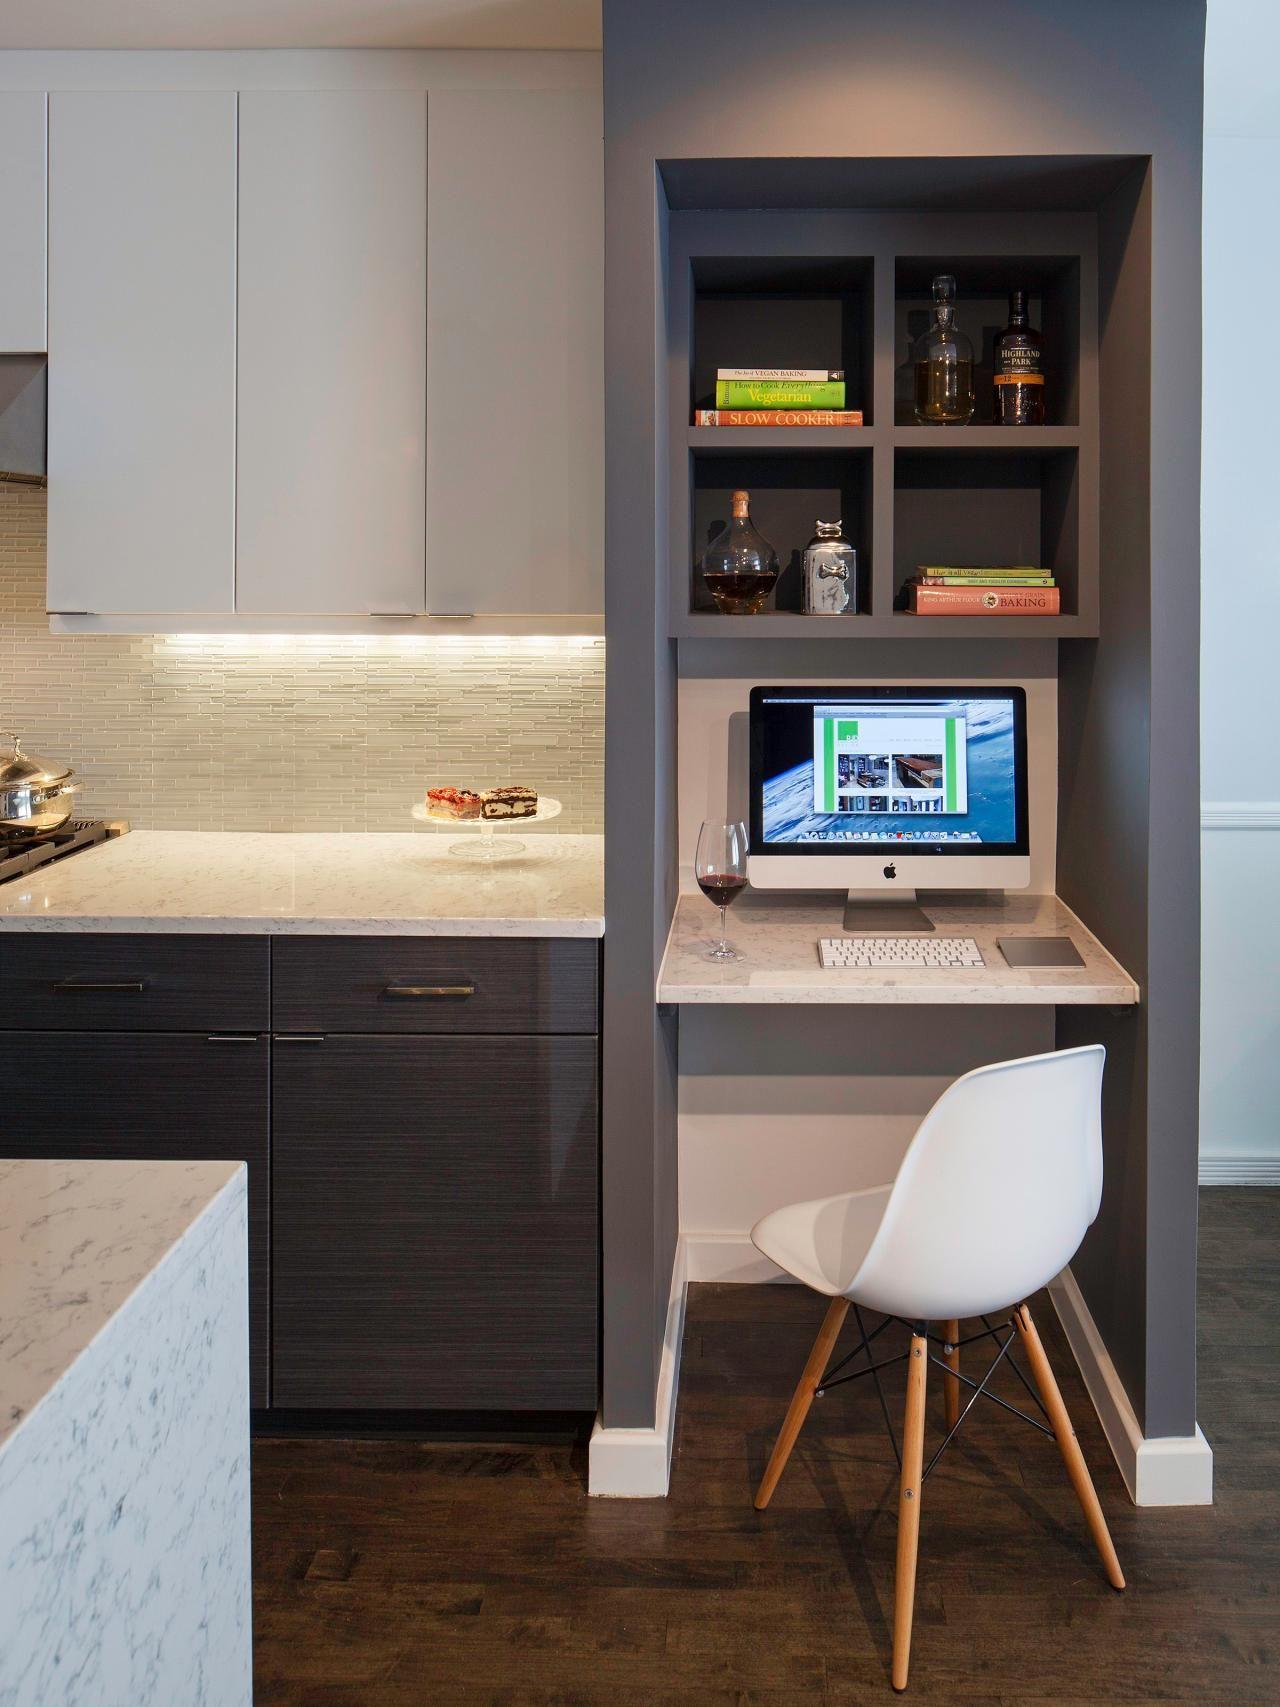 work station kitchen remodel kansas city best hgtv faces of design pinterest